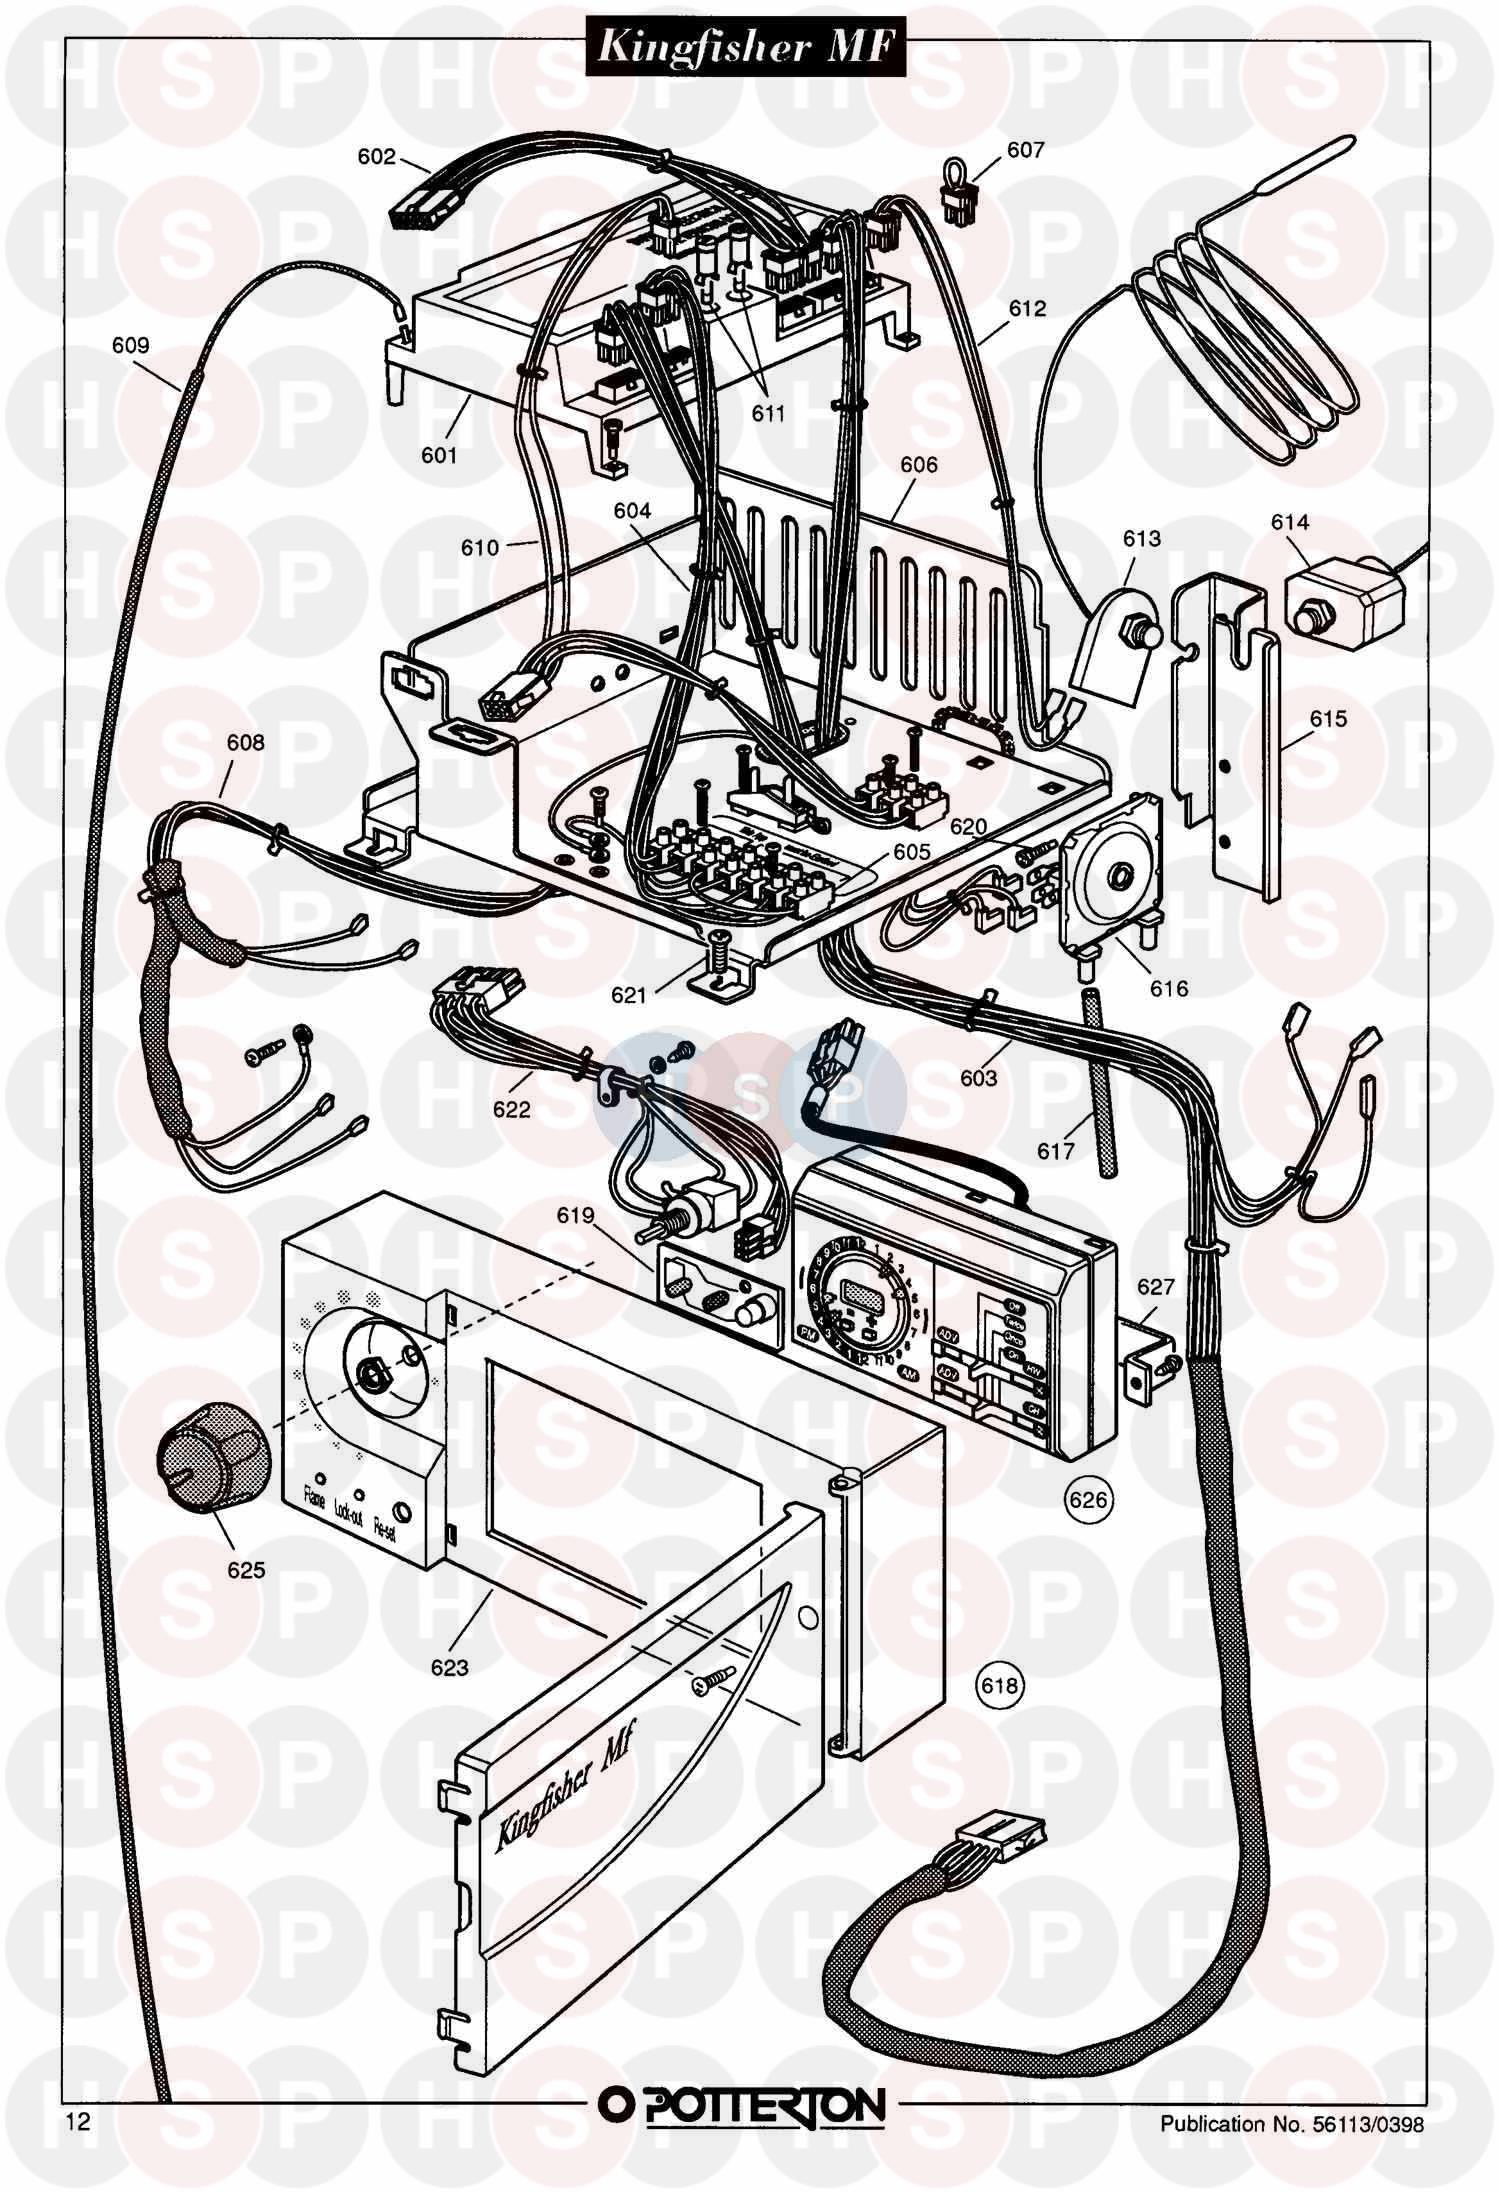 potterton kingfisher mf rs40  assembly 5  diagram